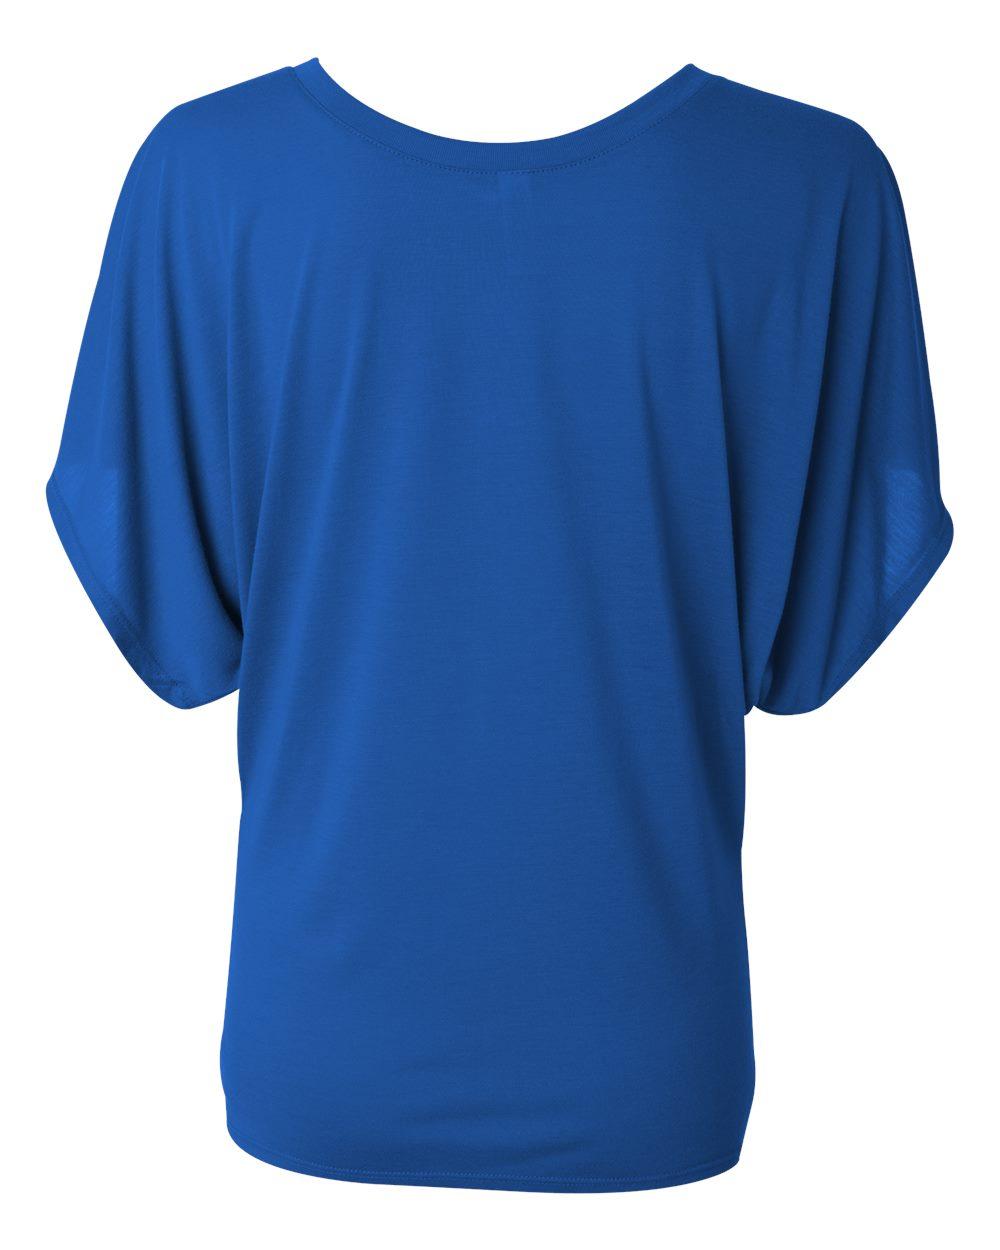 Bella-Canvas-Women-039-s-Flowy-Draped-Sleeve-Dolman-T-Shirt-8821-S-2XL thumbnail 37